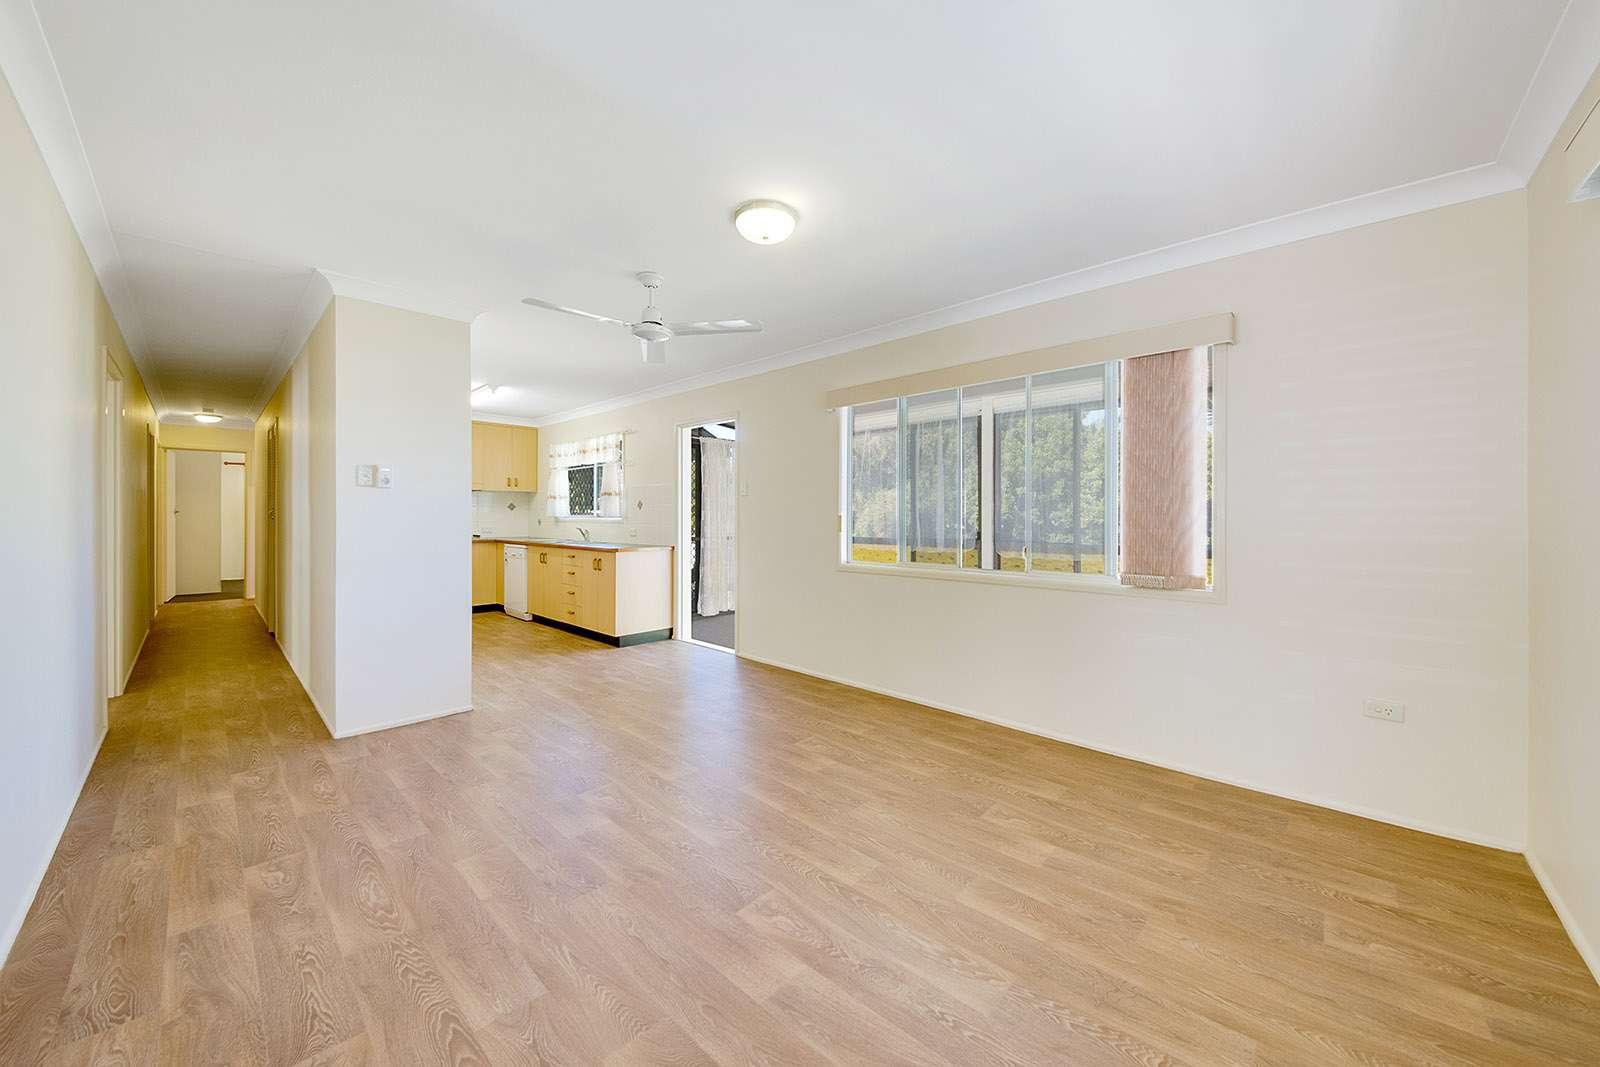 24 Hibiscus Avenue, Sun Valley, QLD 4680